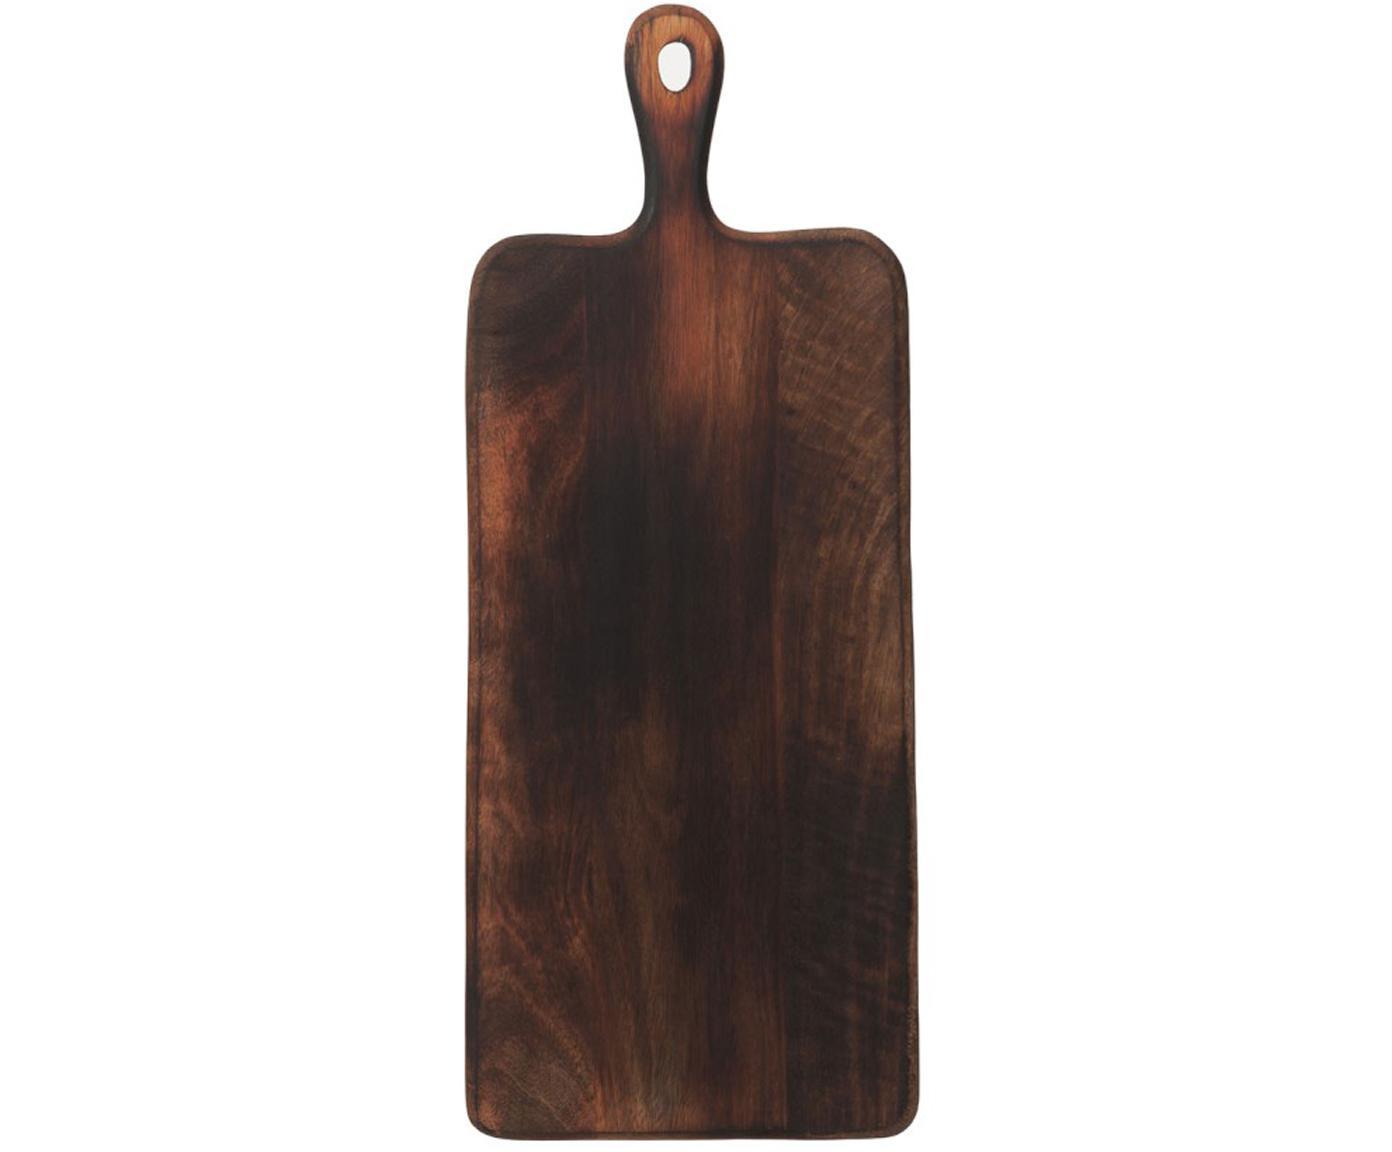 Snijplank Branek, Hout, Mangohoutkleurig, 50 x 1 cm